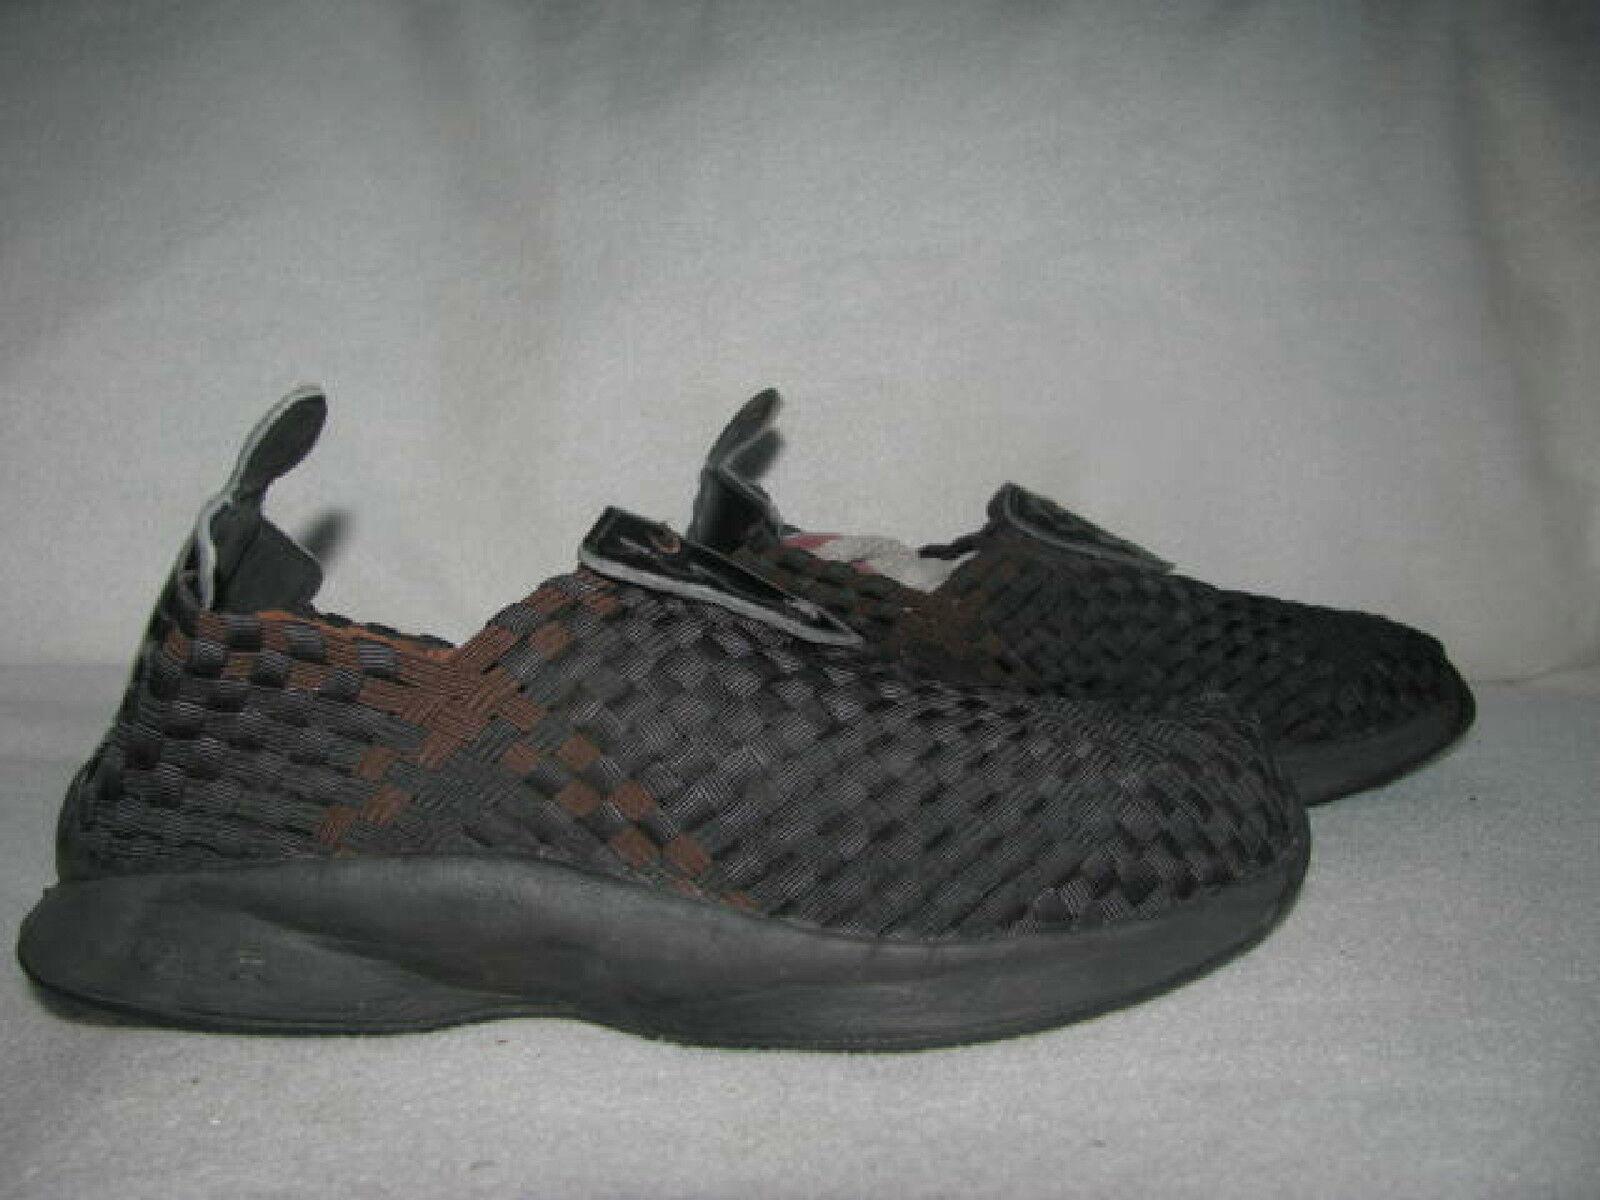 Nike Air Woven Noir /Brown Sz 6 Hommes Sneakers Athletic Chaussures 609065-021